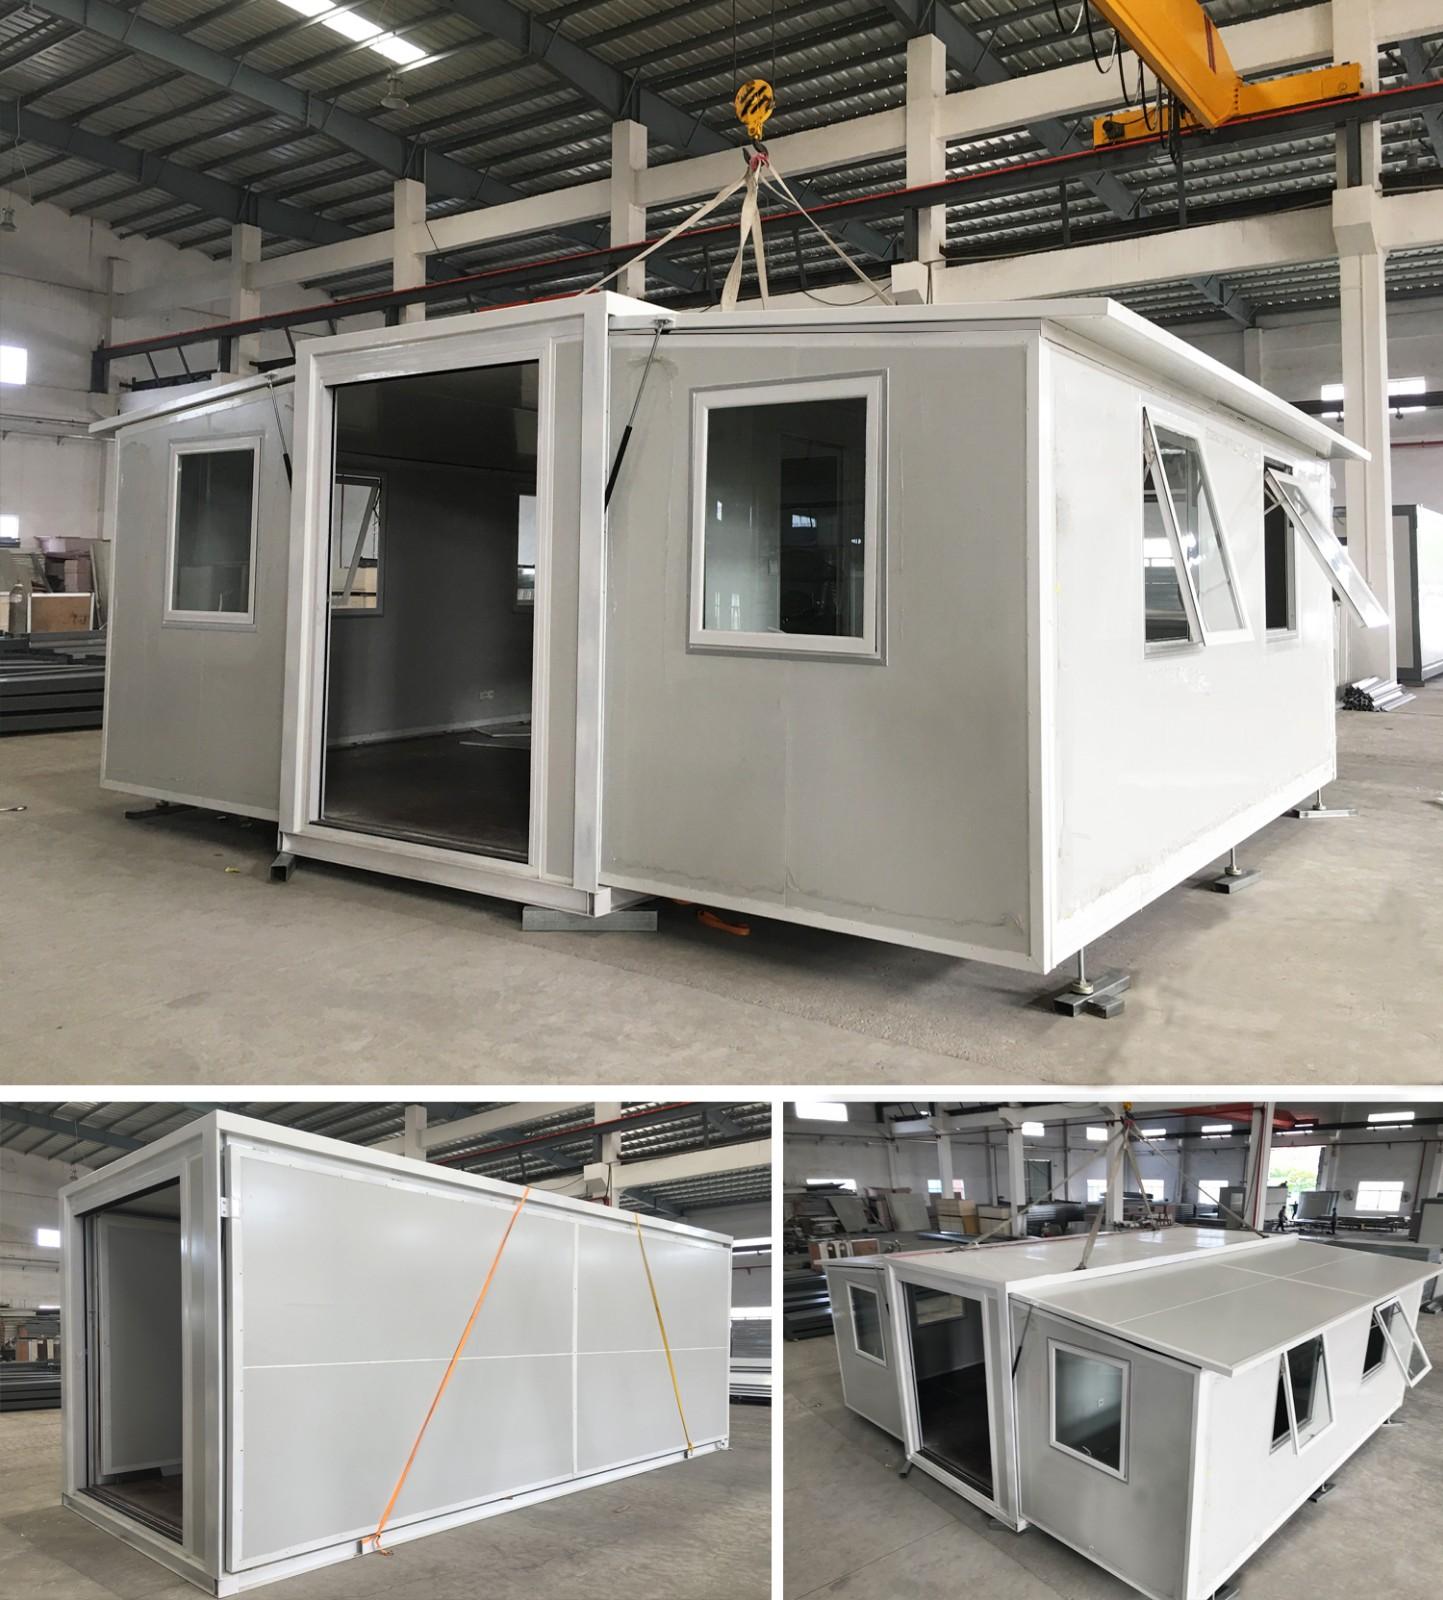 product-WELLCAMP, WELLCAMP prefab house, WELLCAMP container house-2020 New Prefab Storage Container